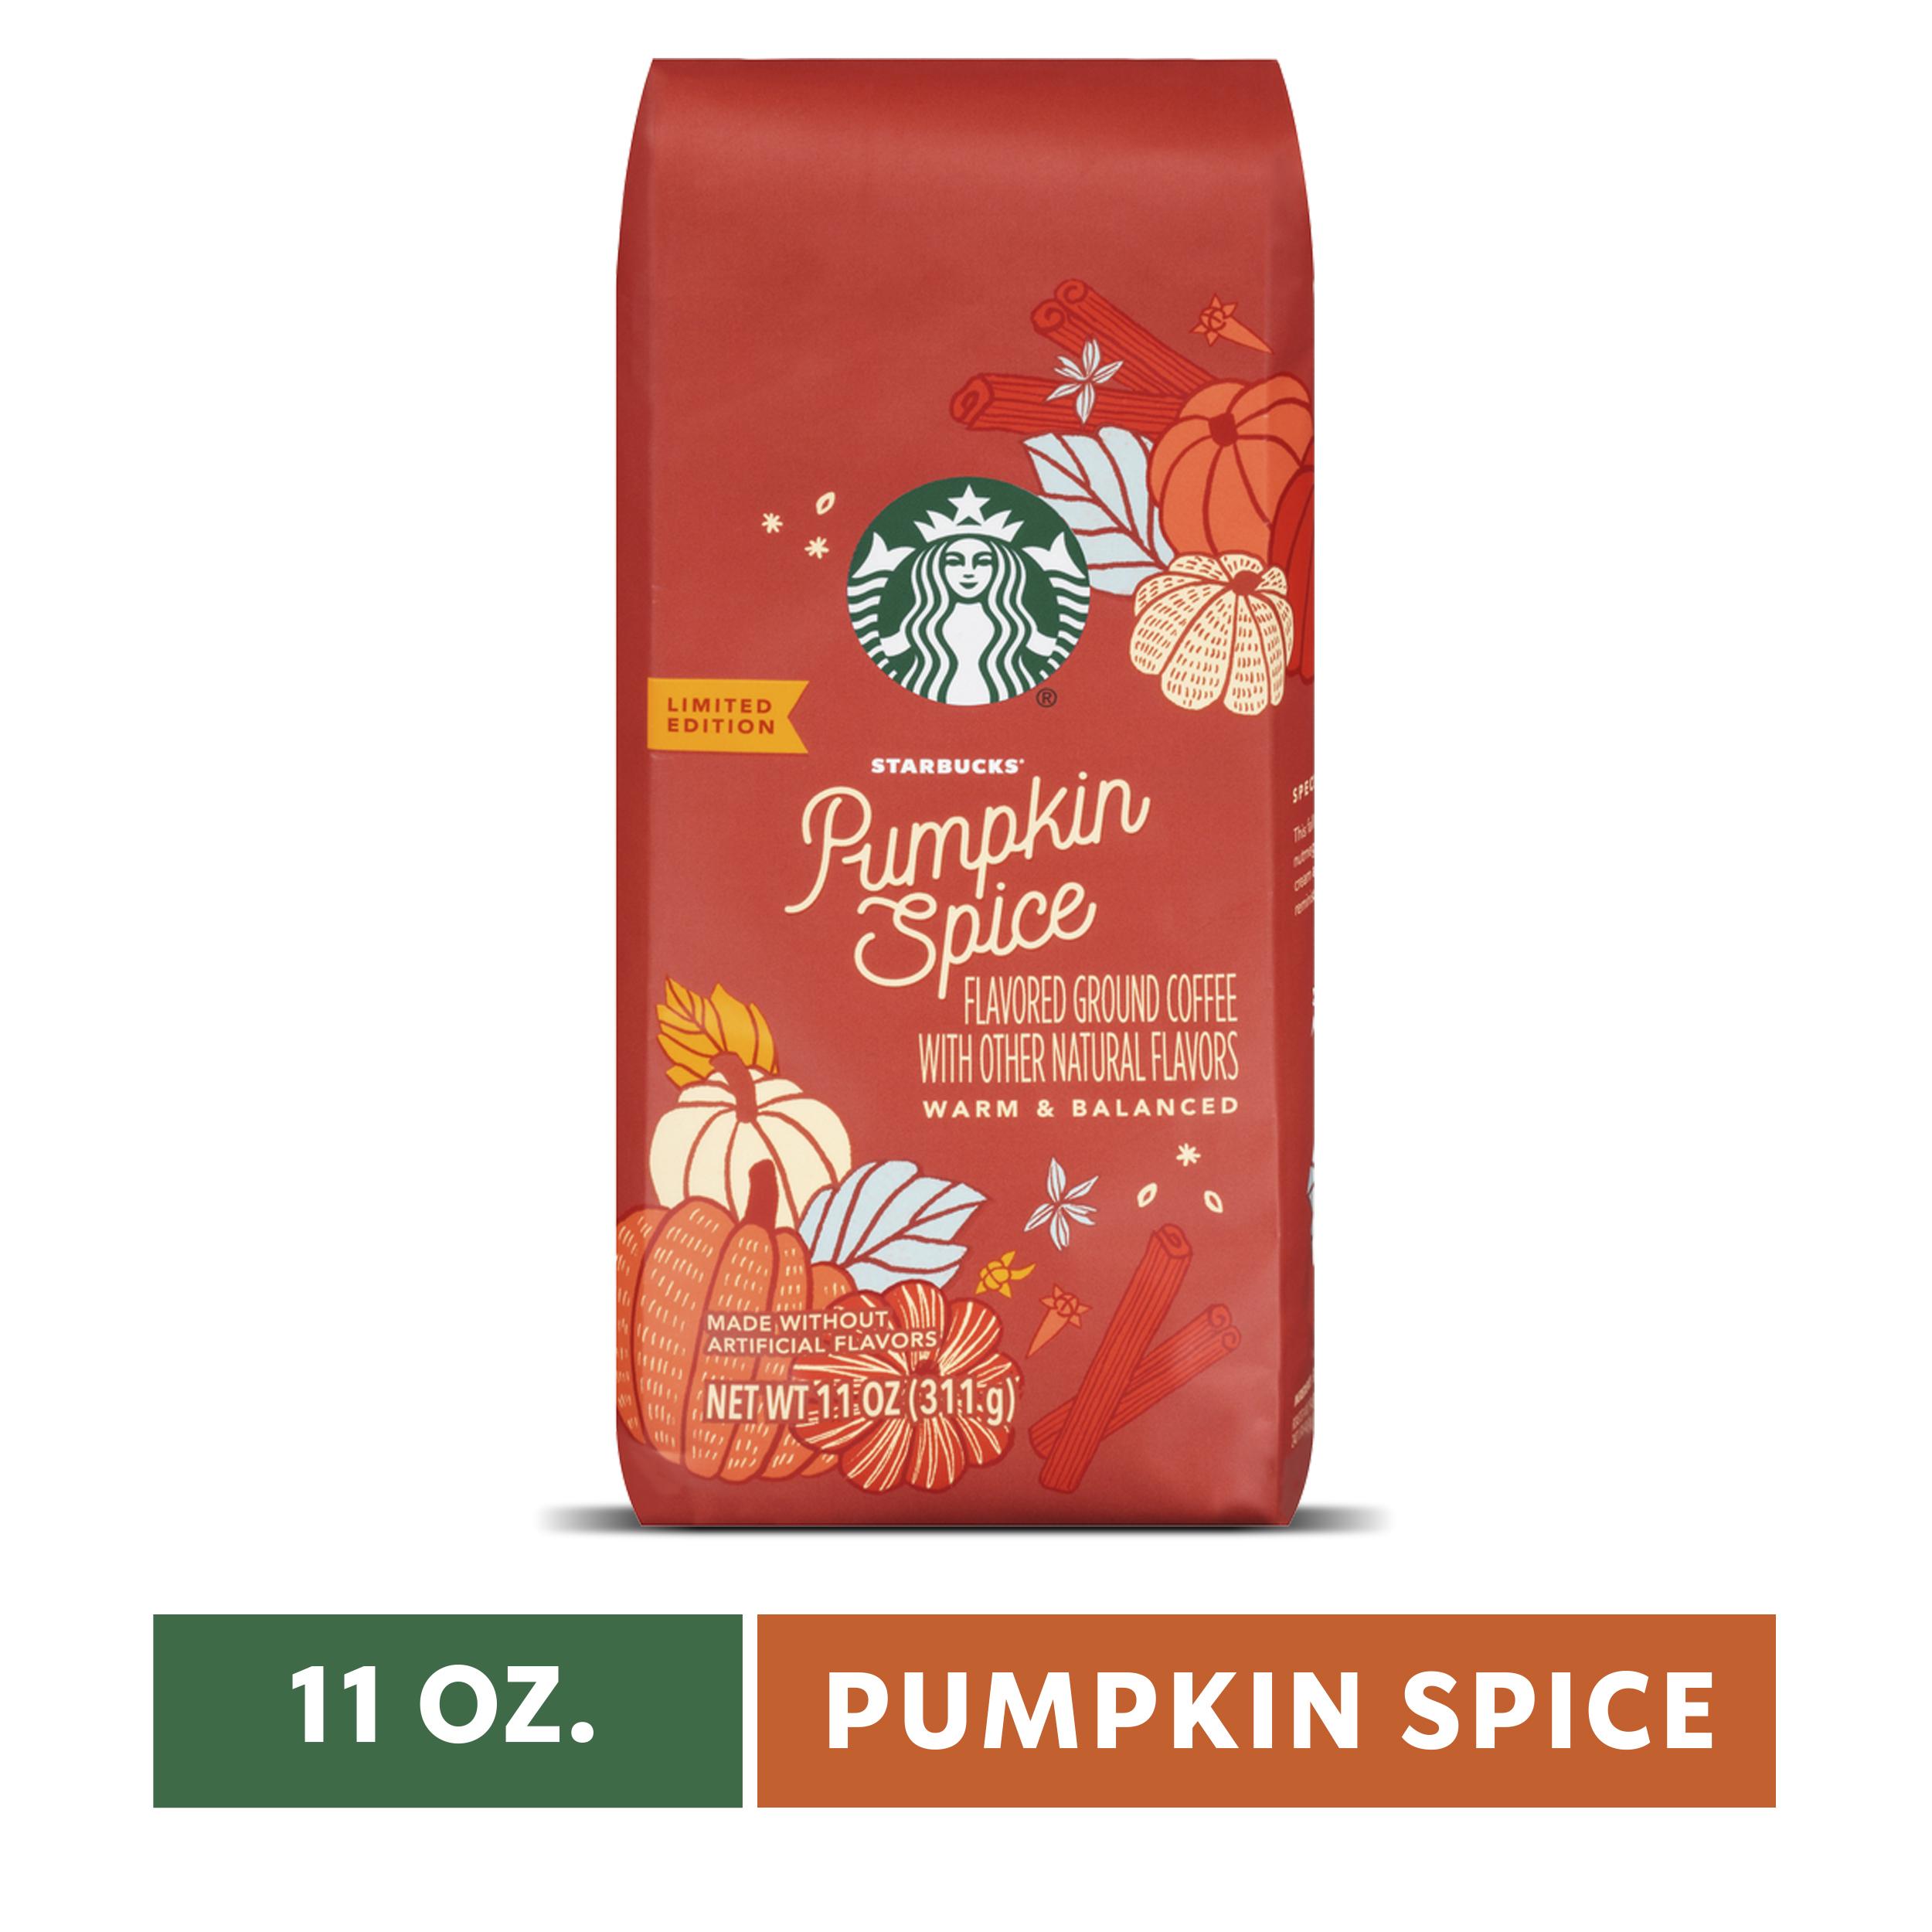 Starbucks Pumpkin Spice Flavored Ground Coffee, Medium Roast 11-Ounce Bag, $3.15, Walmart, shipping only